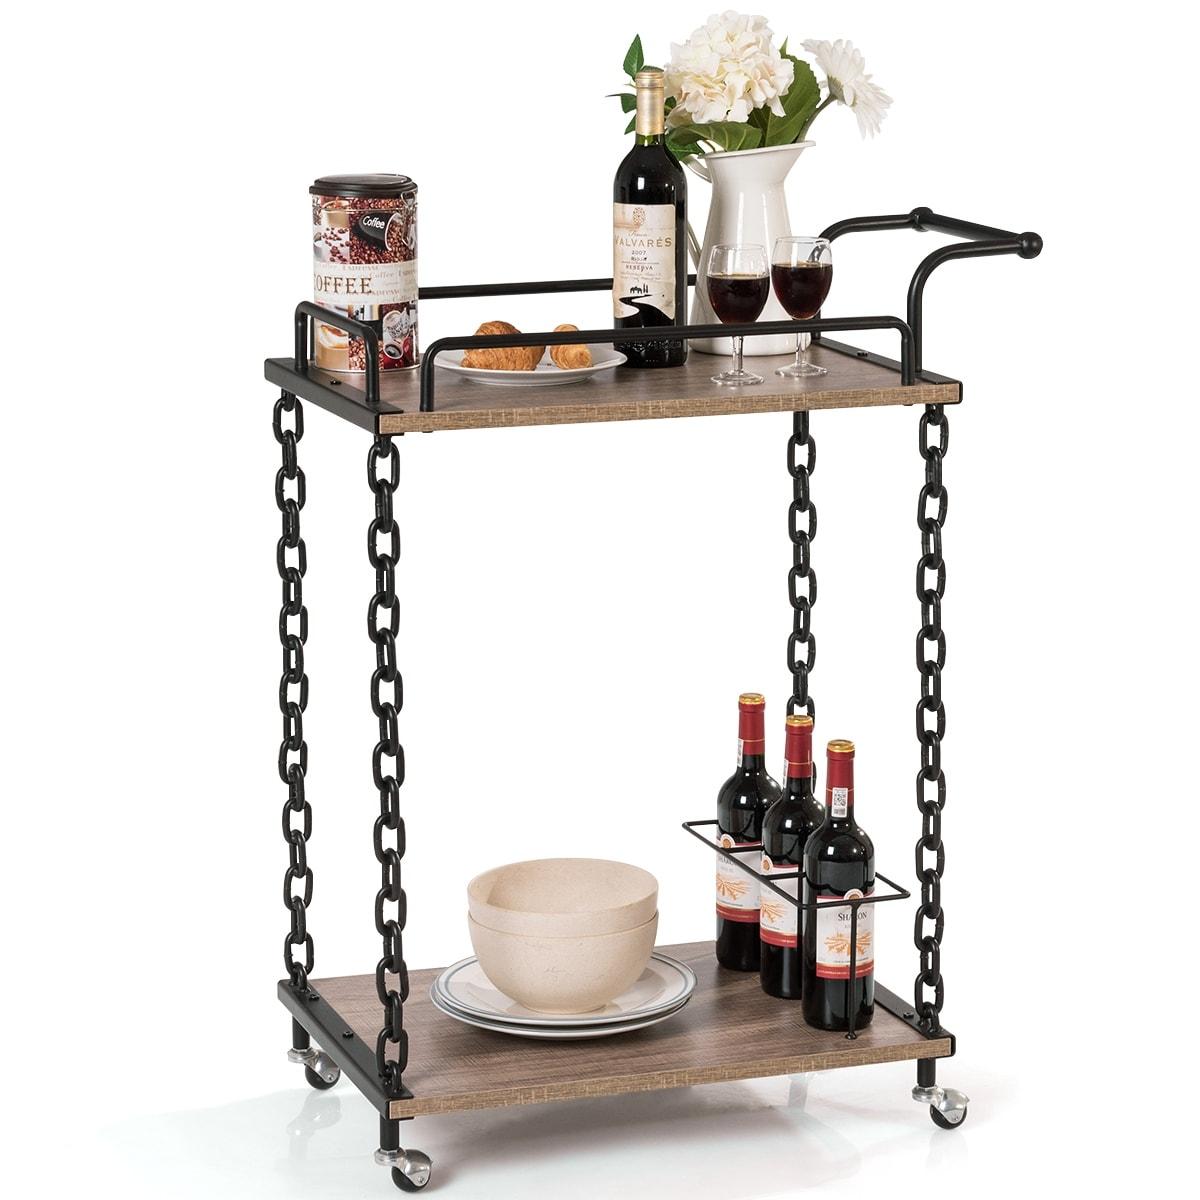 3ba409f56b6c 2-Tier Wood Metal Bar Cart, Indoor Serving Wine Tea Holder with Caster  Wheels, Multifunctional Modern Entertainment - as pics